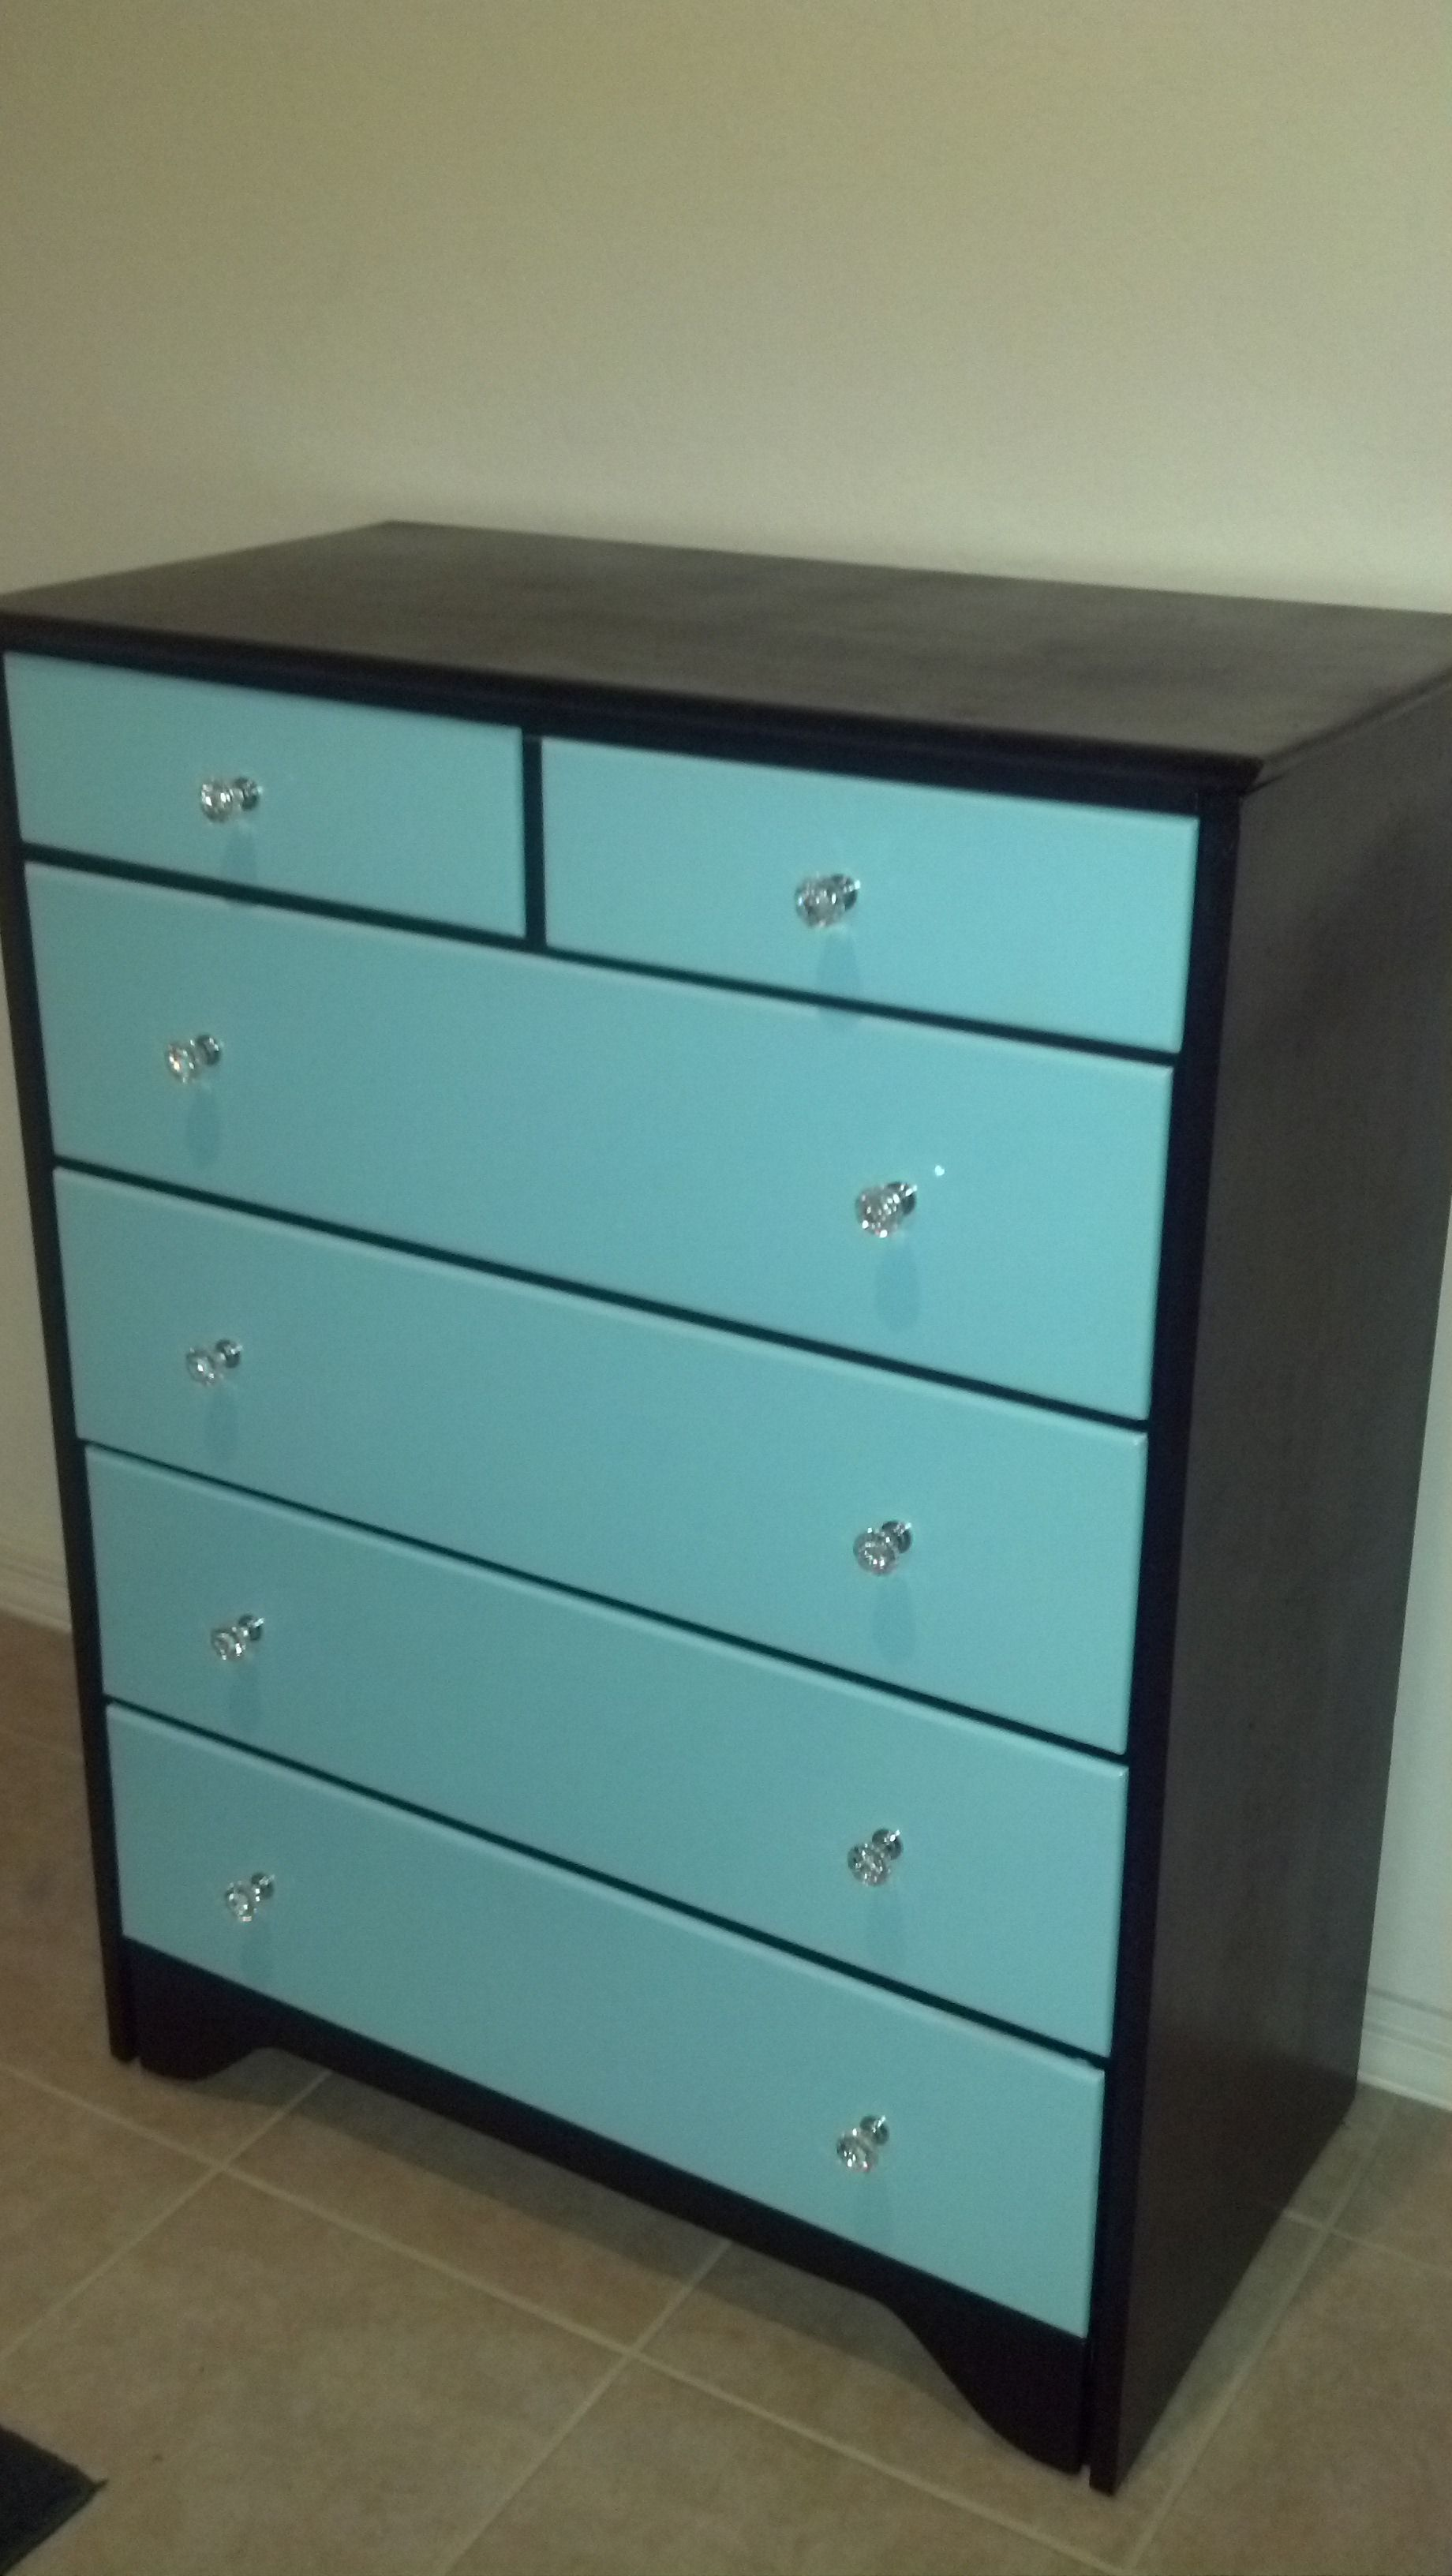 Black And Tiffany Blue Dresser With Acrylic Drawer Pulls I Did A Good Job